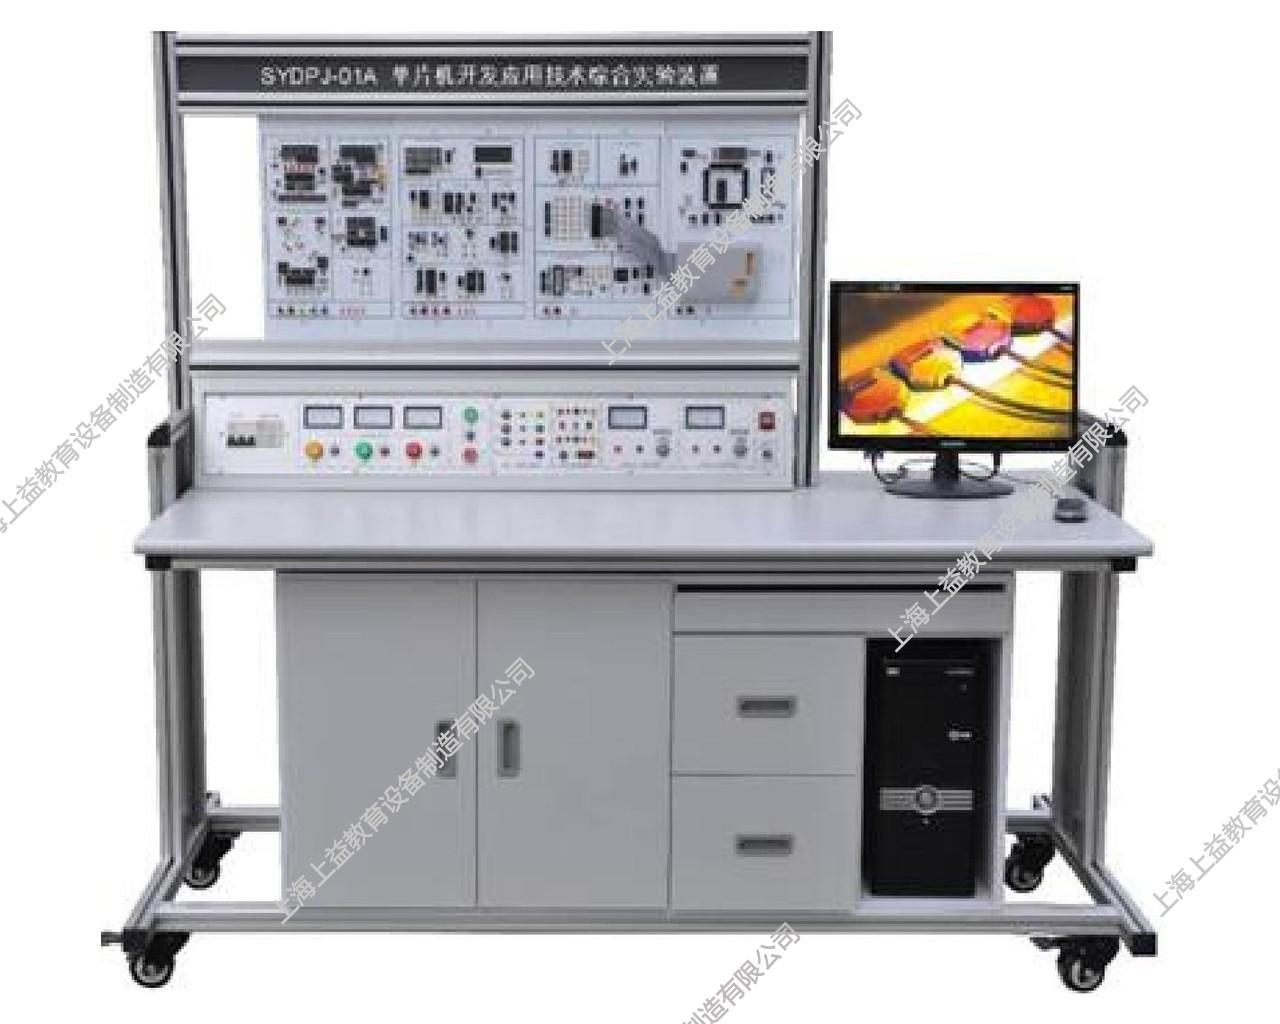 SYDPX-238单片机技术应用wwwlehu8viplehu68vip装置